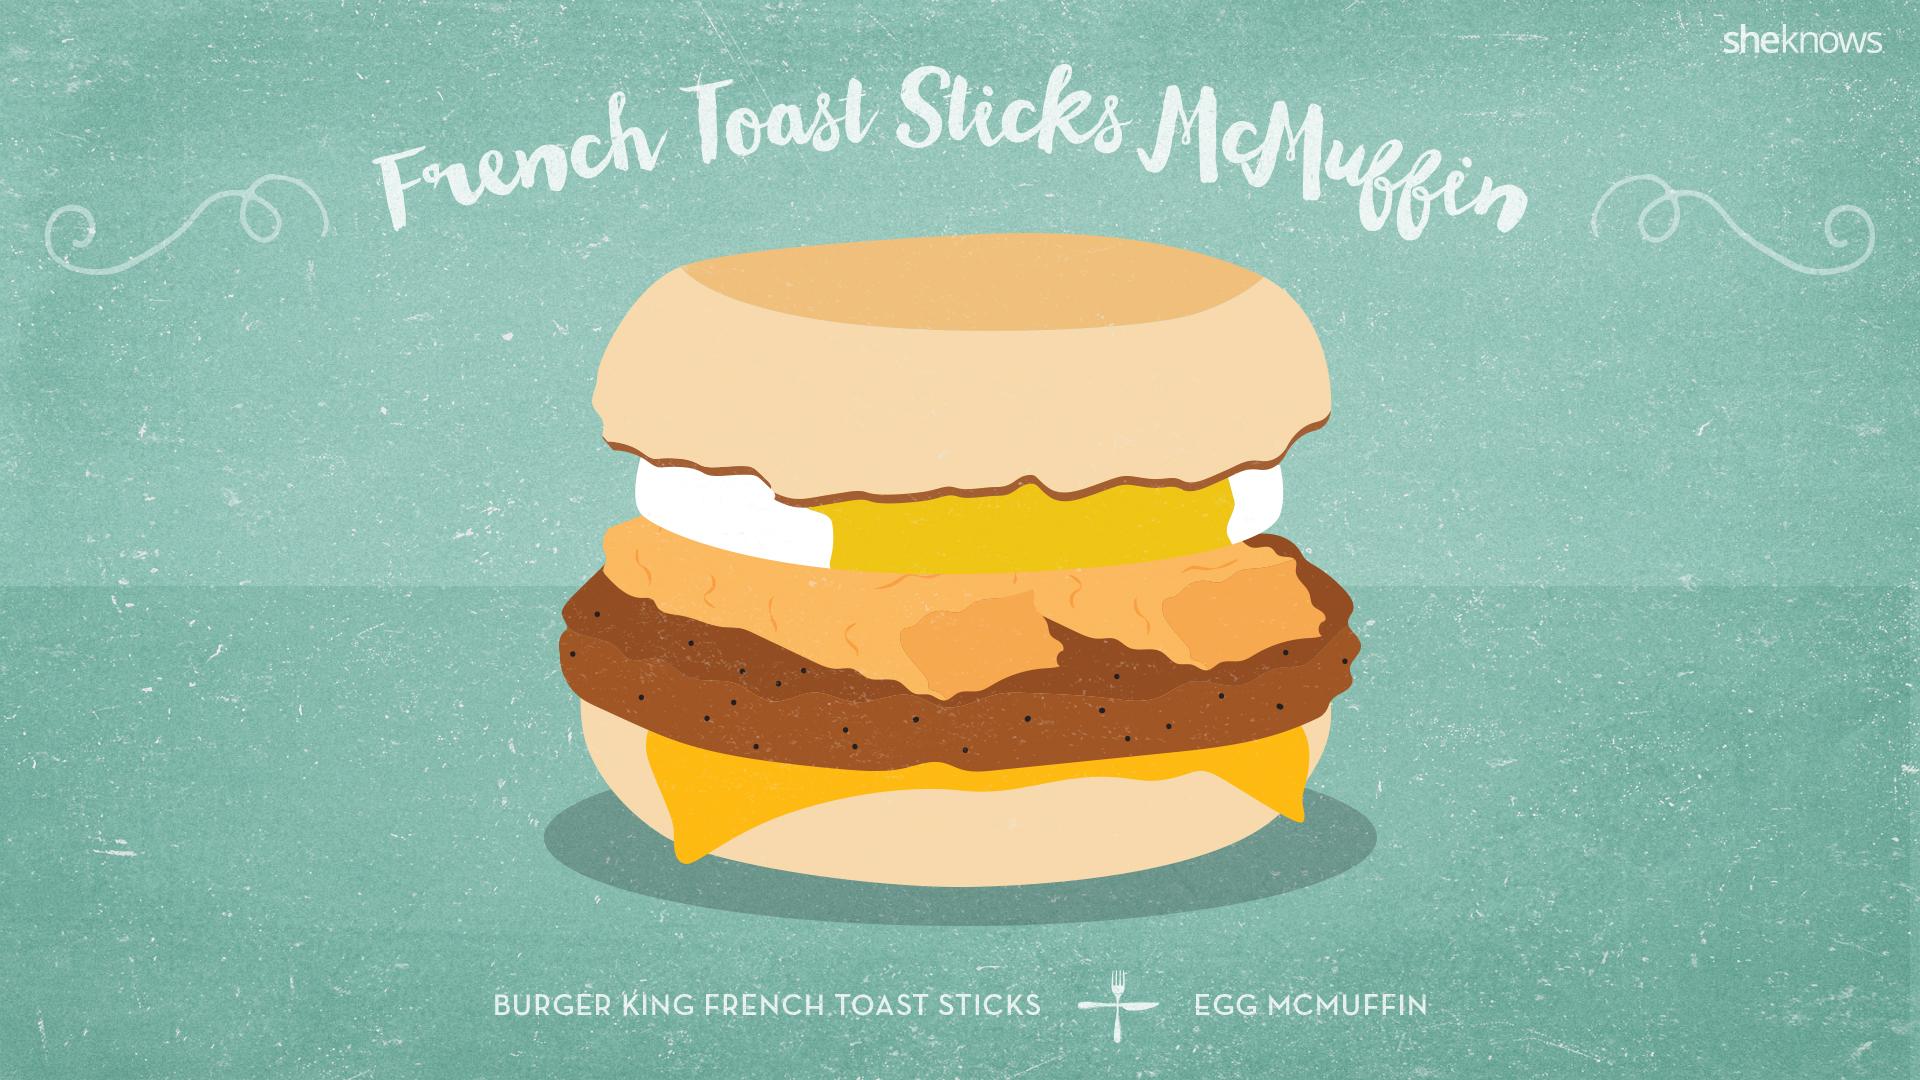 French Toast Sticks McMuffin